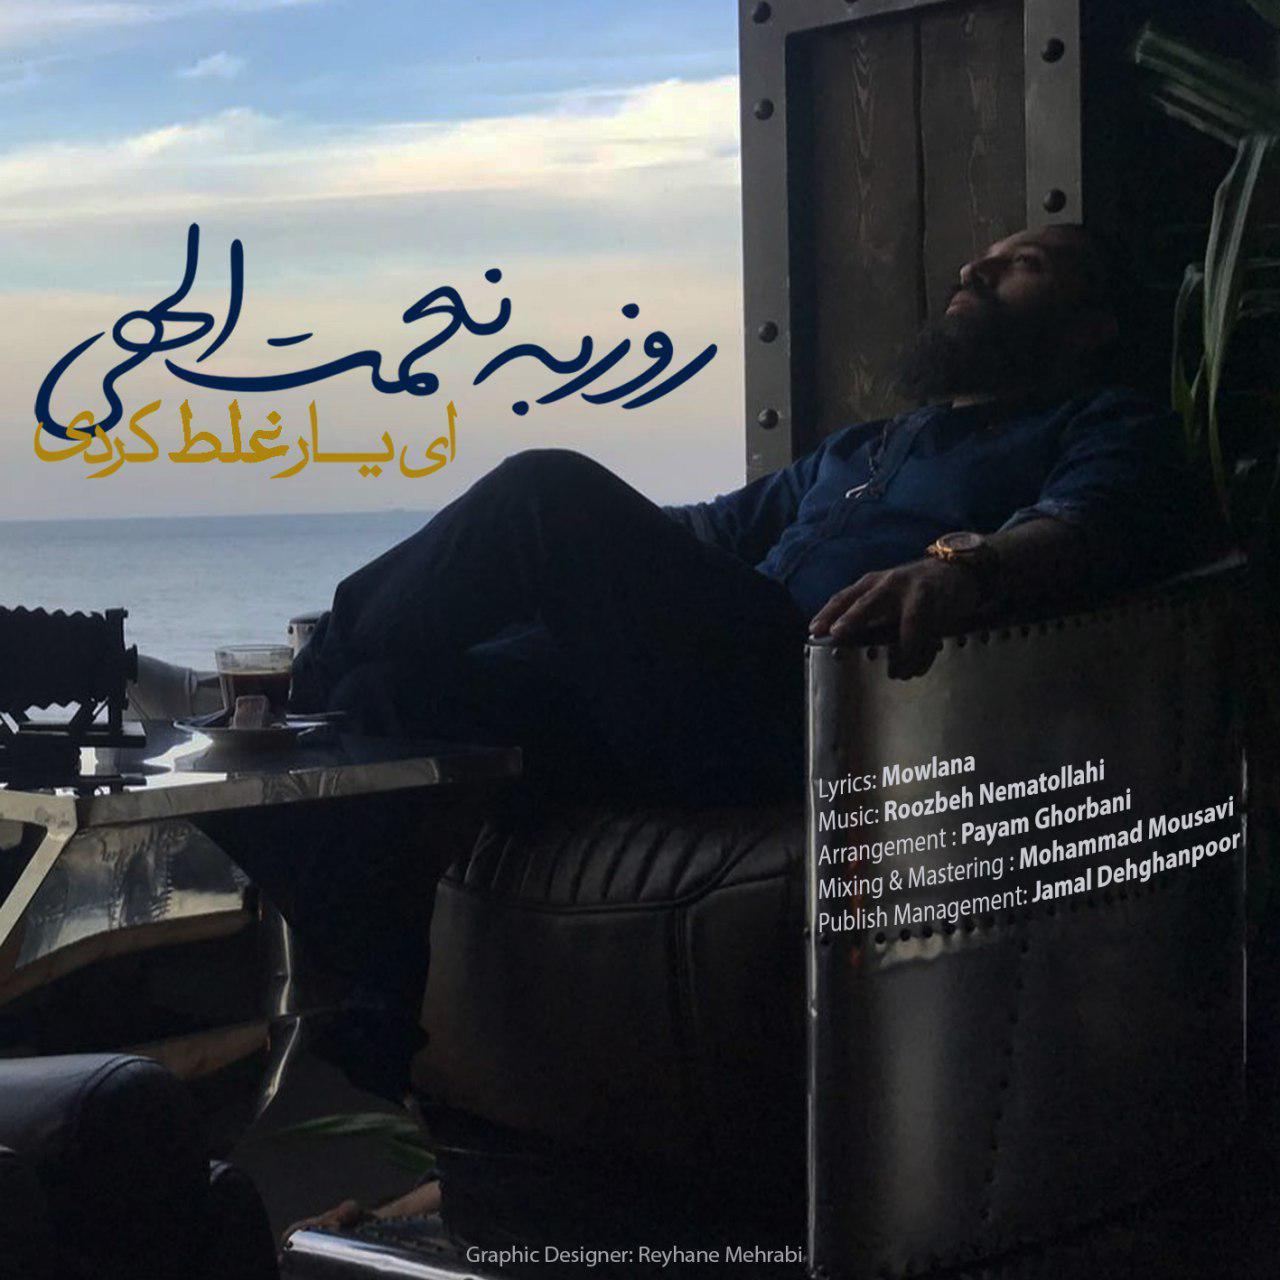 Roozbeh Nematollahi – Ey Yar Ghalat Kardi